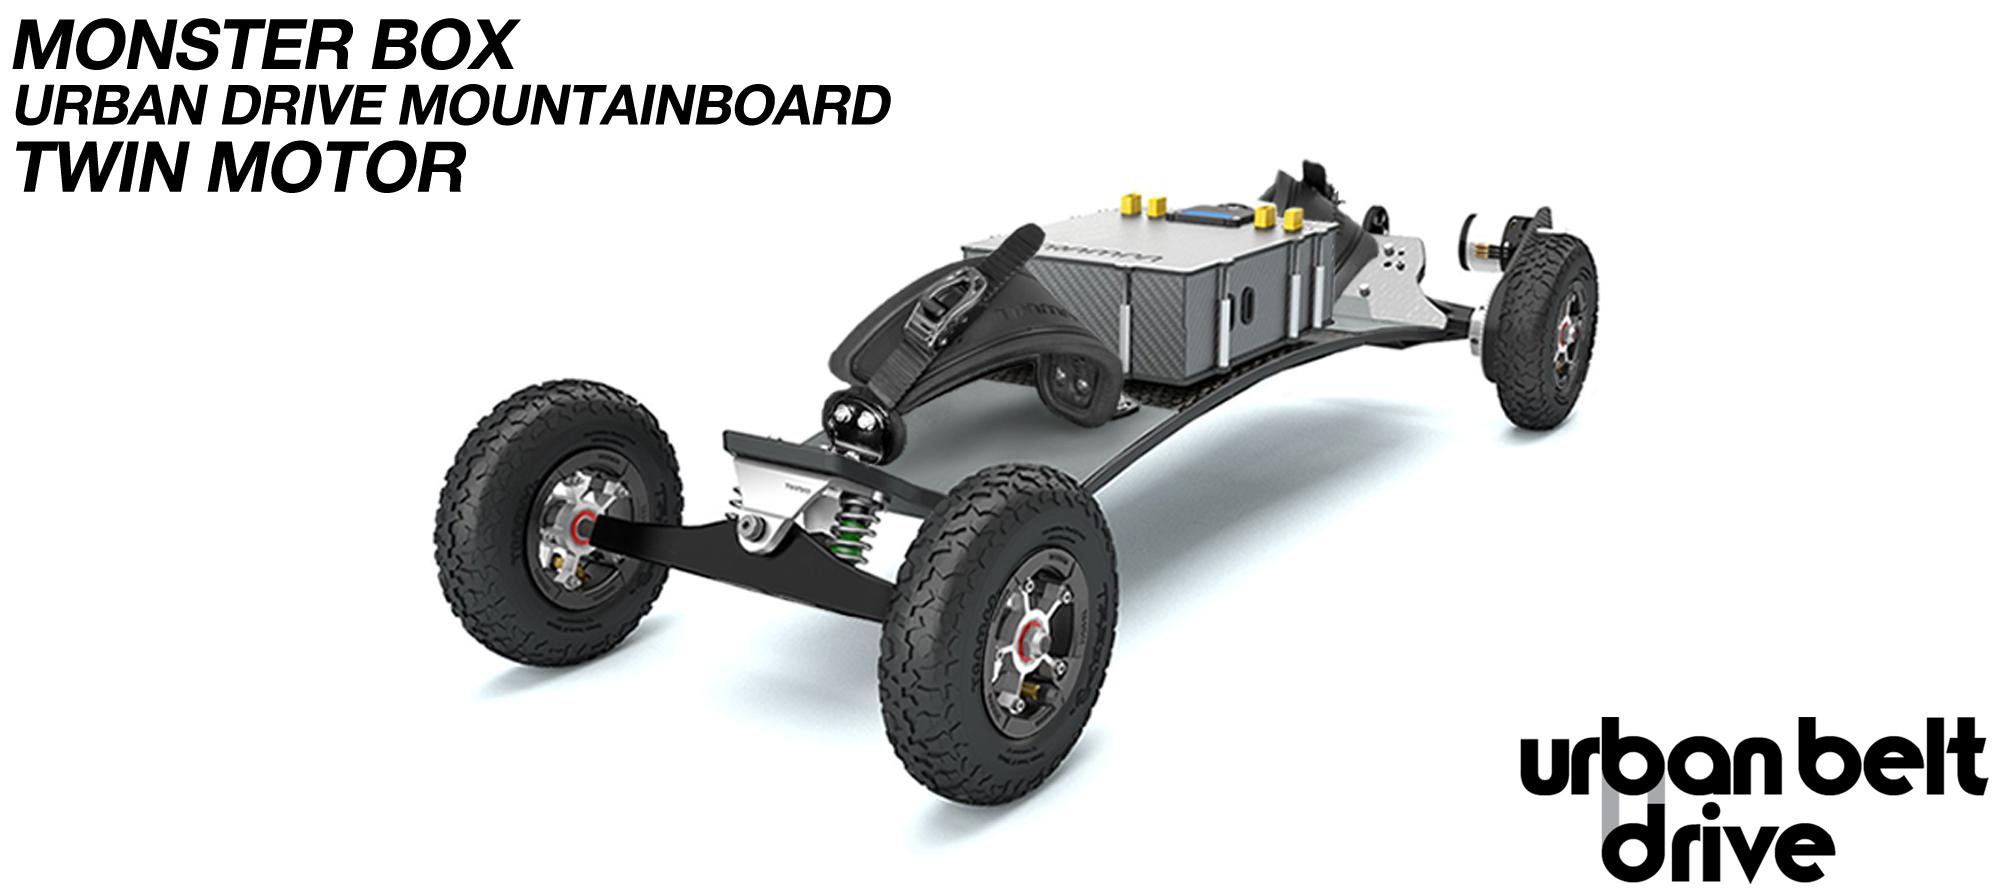 URBAN Electric Mountainboard - TWIN Urban Motor Mounts on TRAMPA ELECTRIC deck ATB Trucks 8 inch Wheels inc Bindings & MONSTER Box with TWIN VESC!